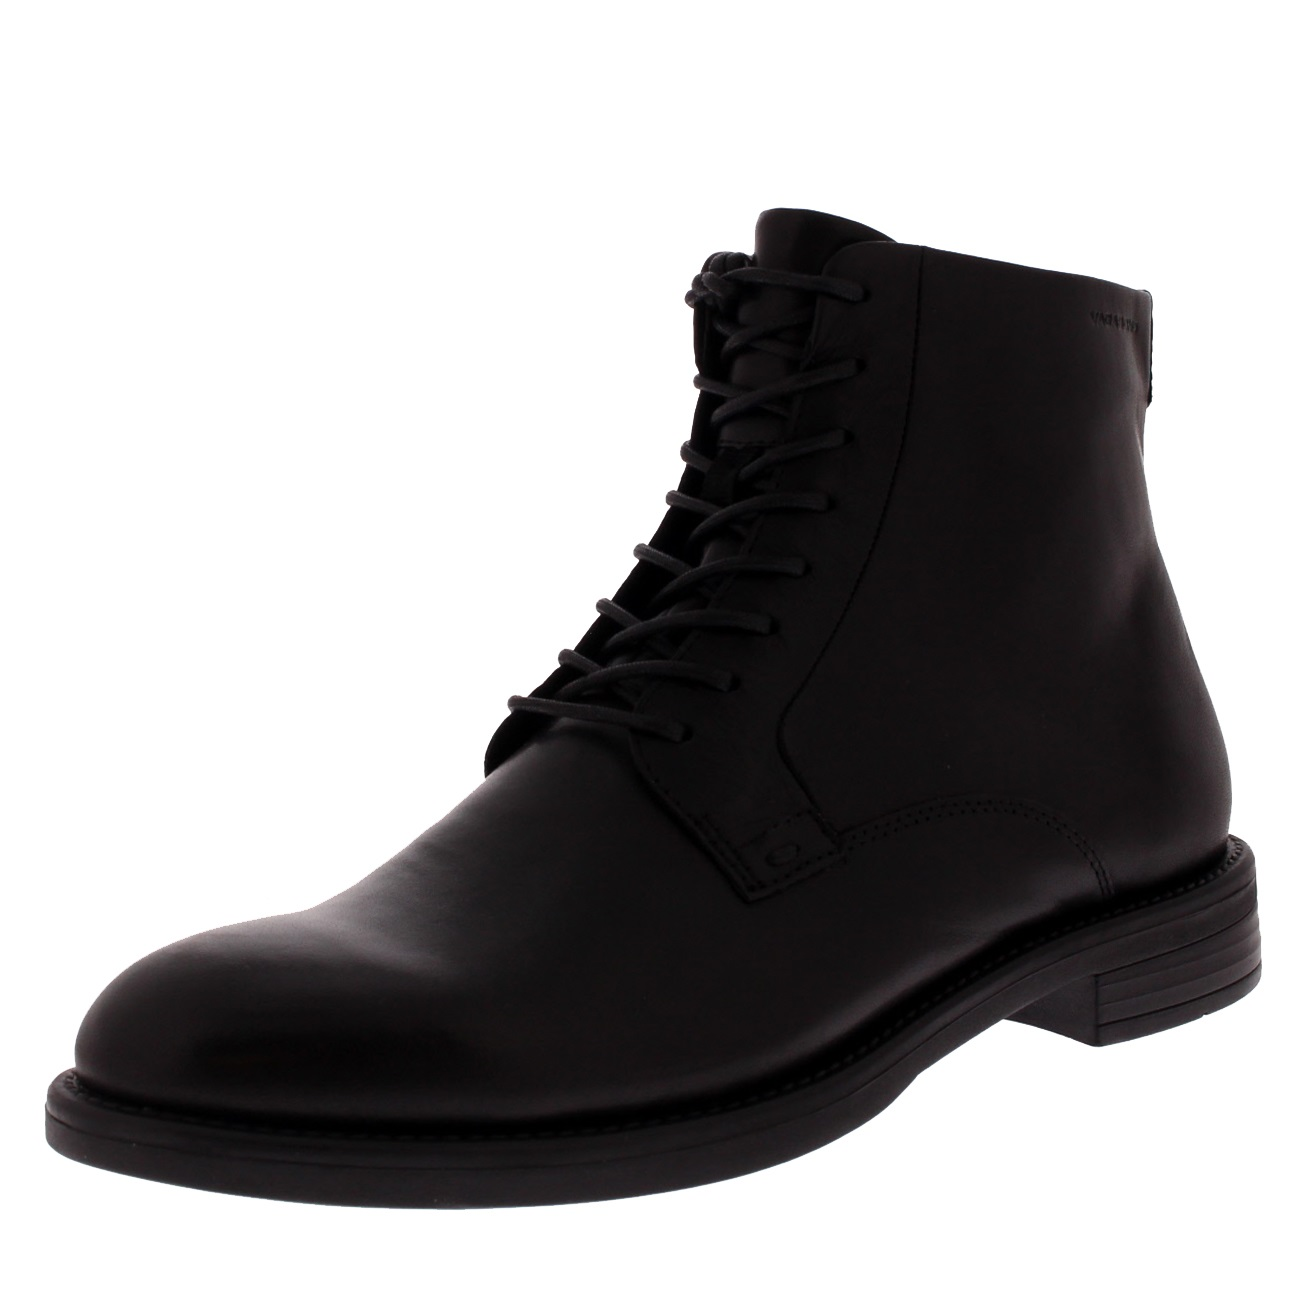 Vagabond Amina Ankle Boot